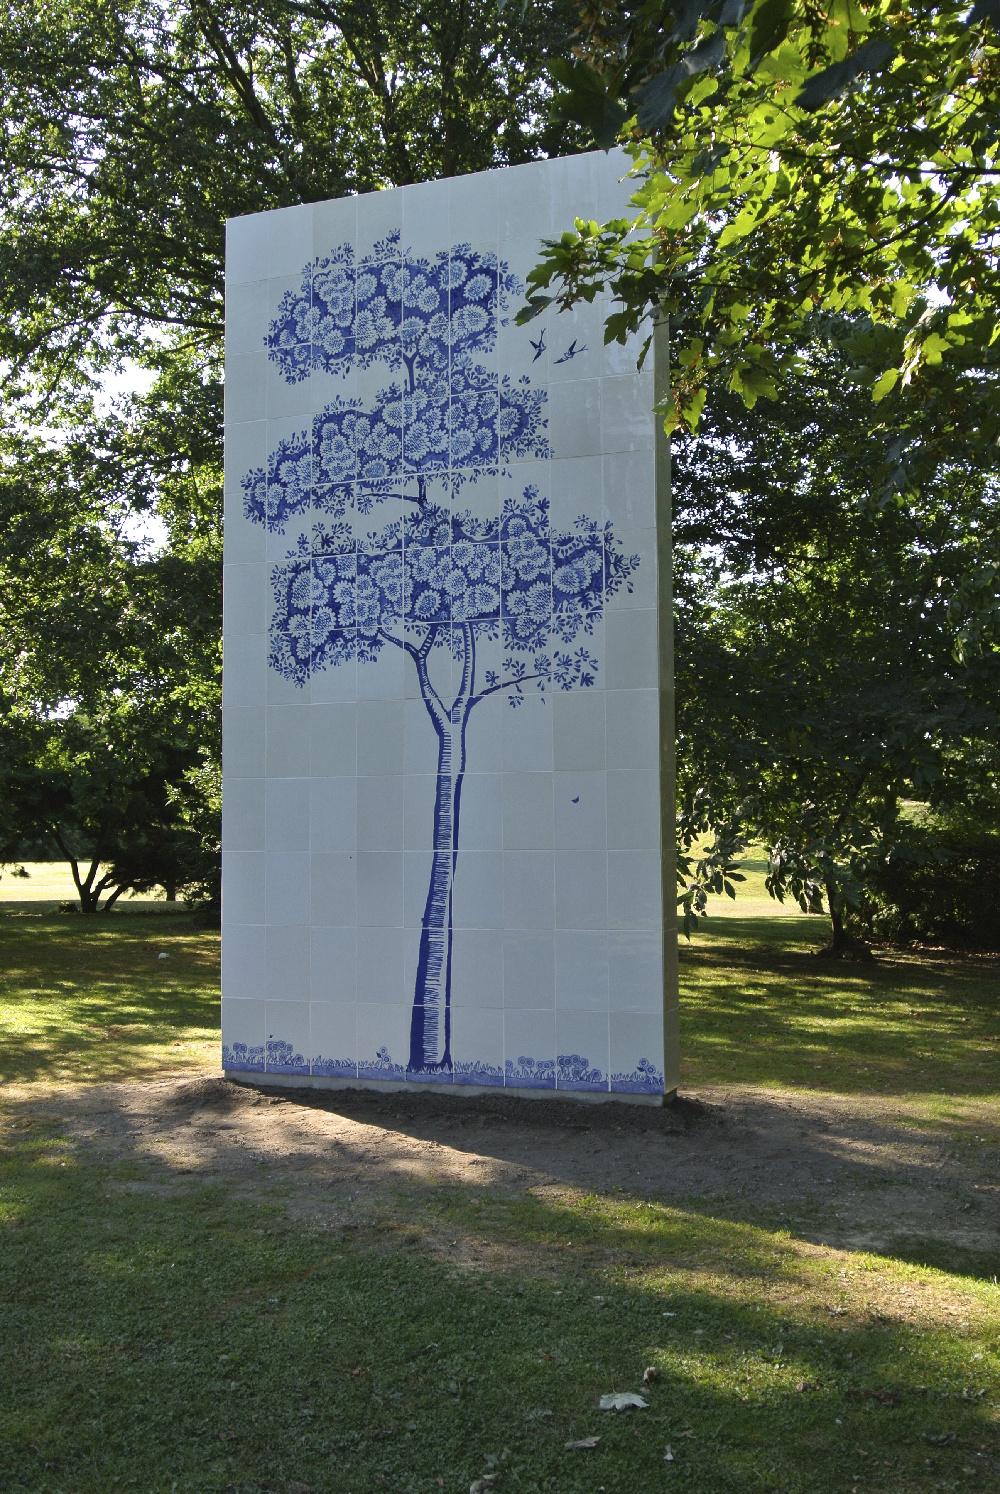 The Guldagergård Tree (after Spode) 5